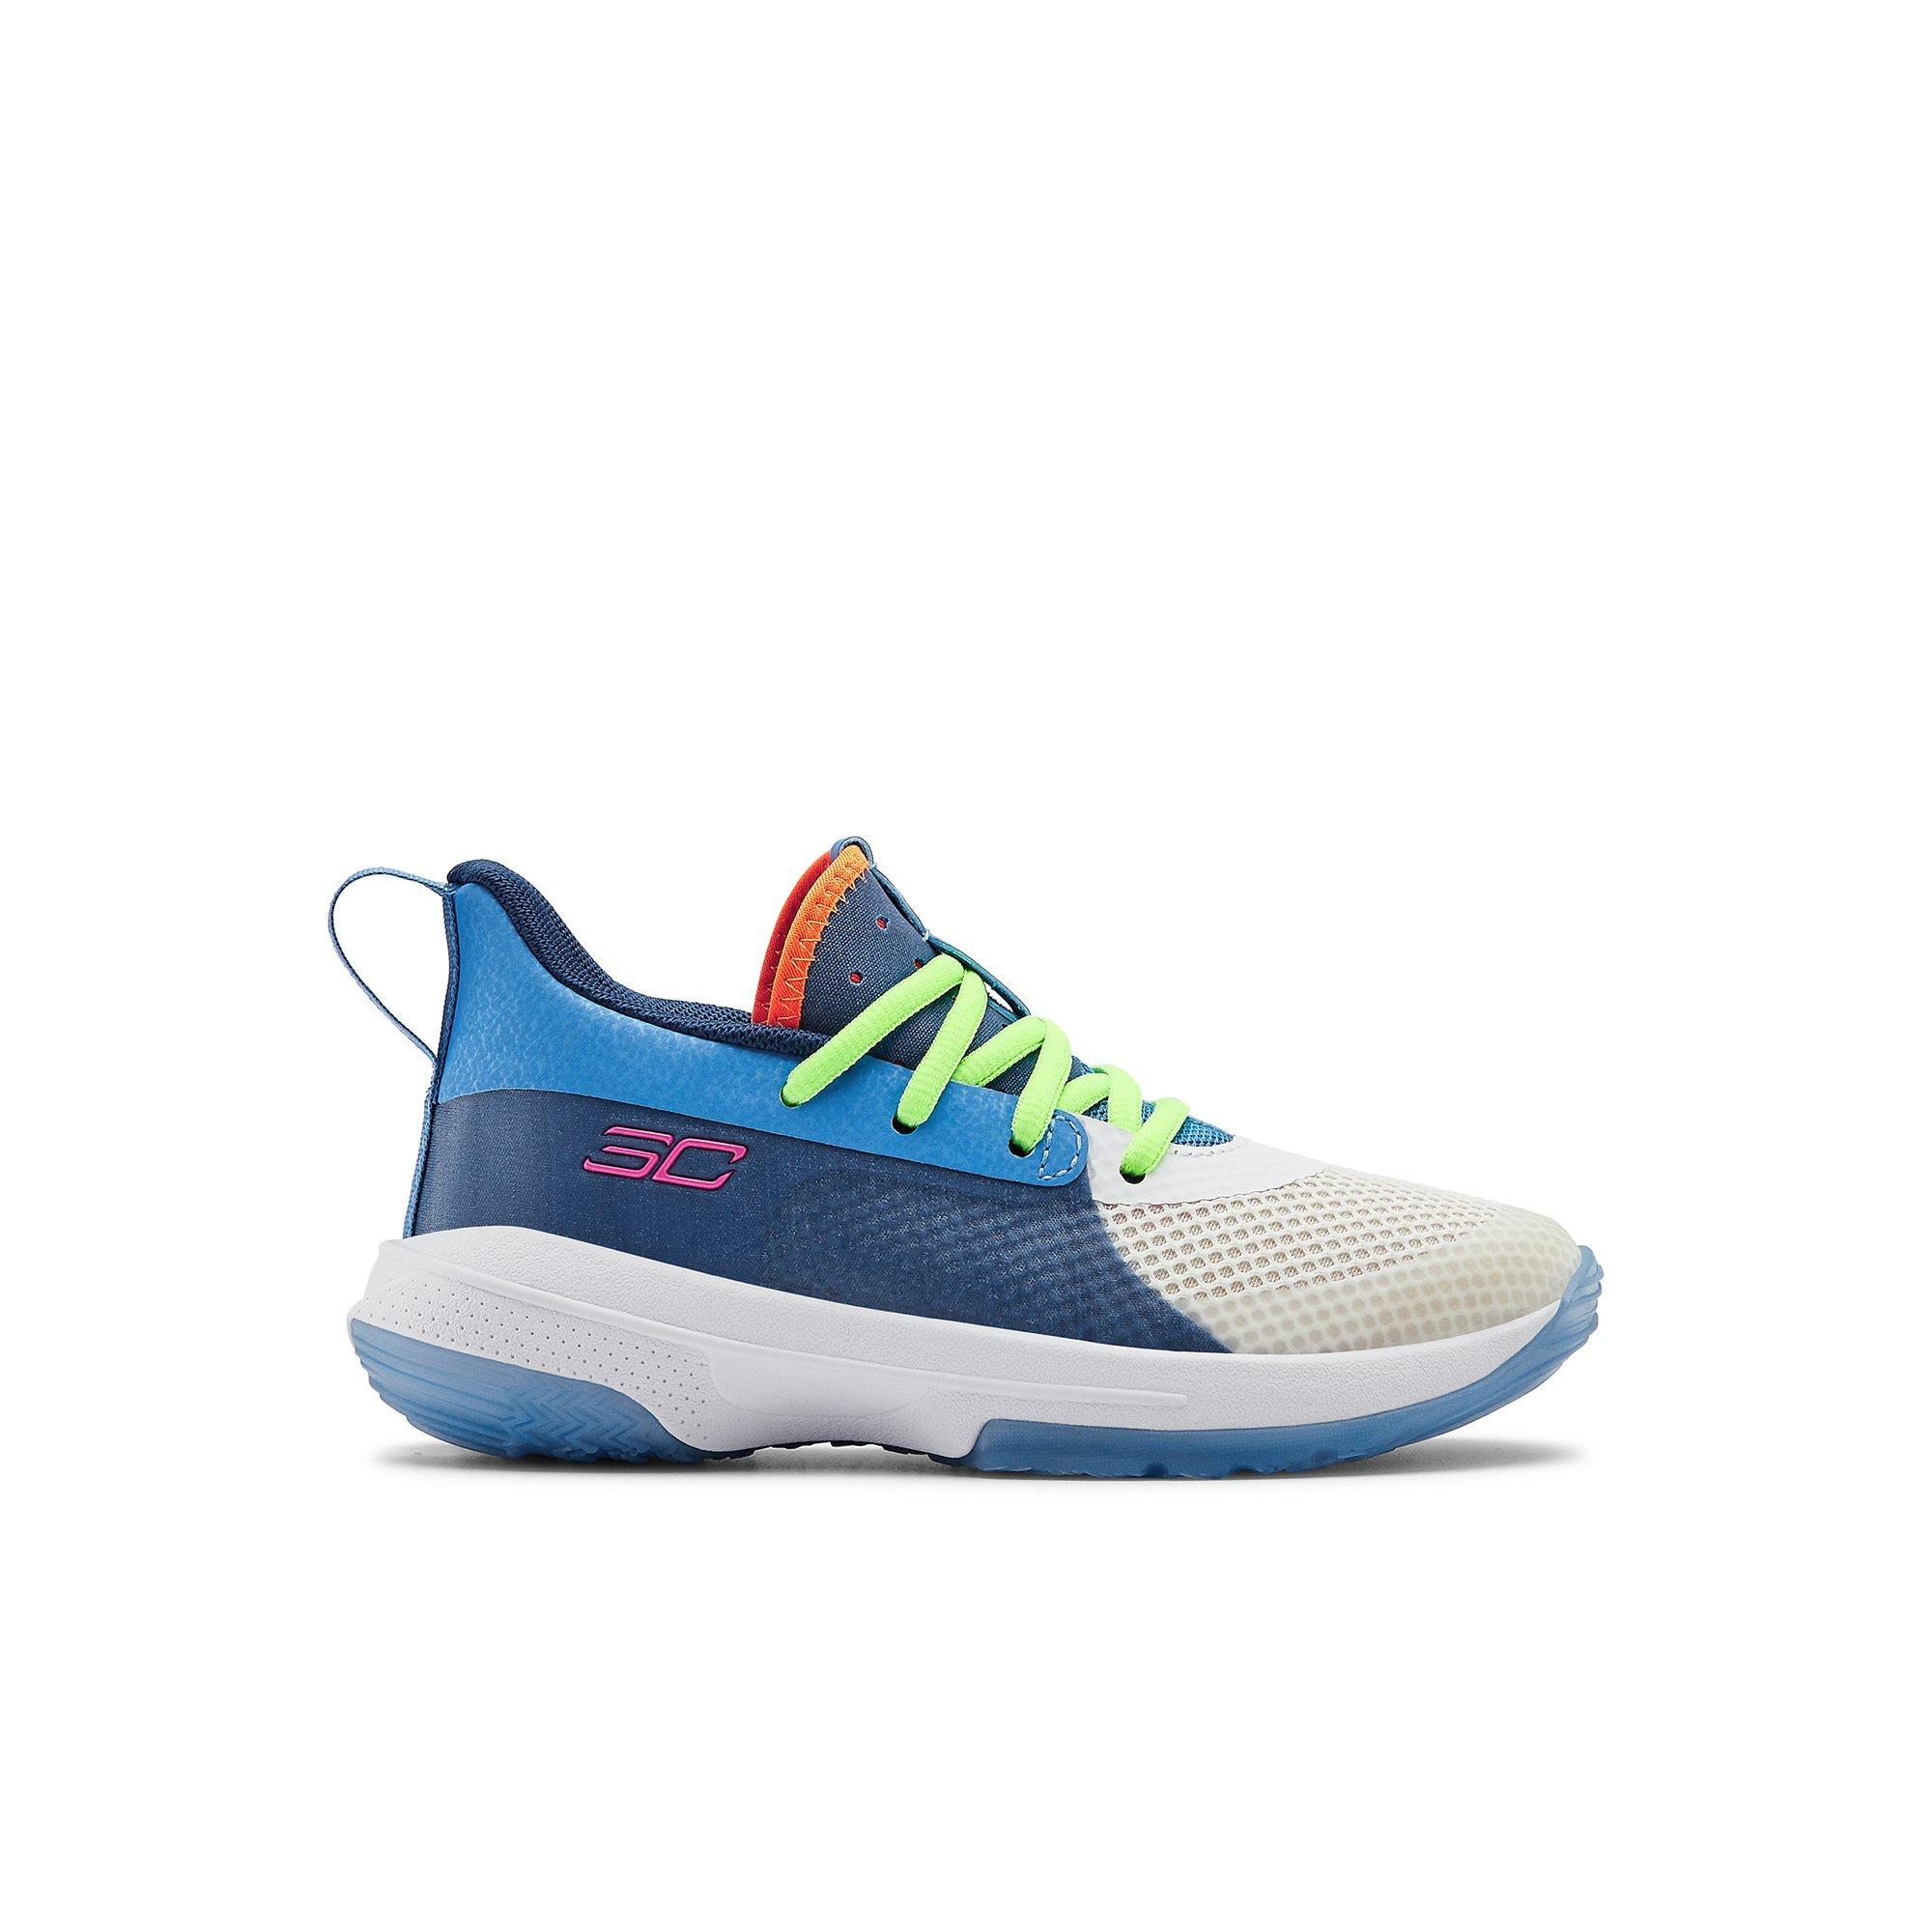 boys steph curry shoes